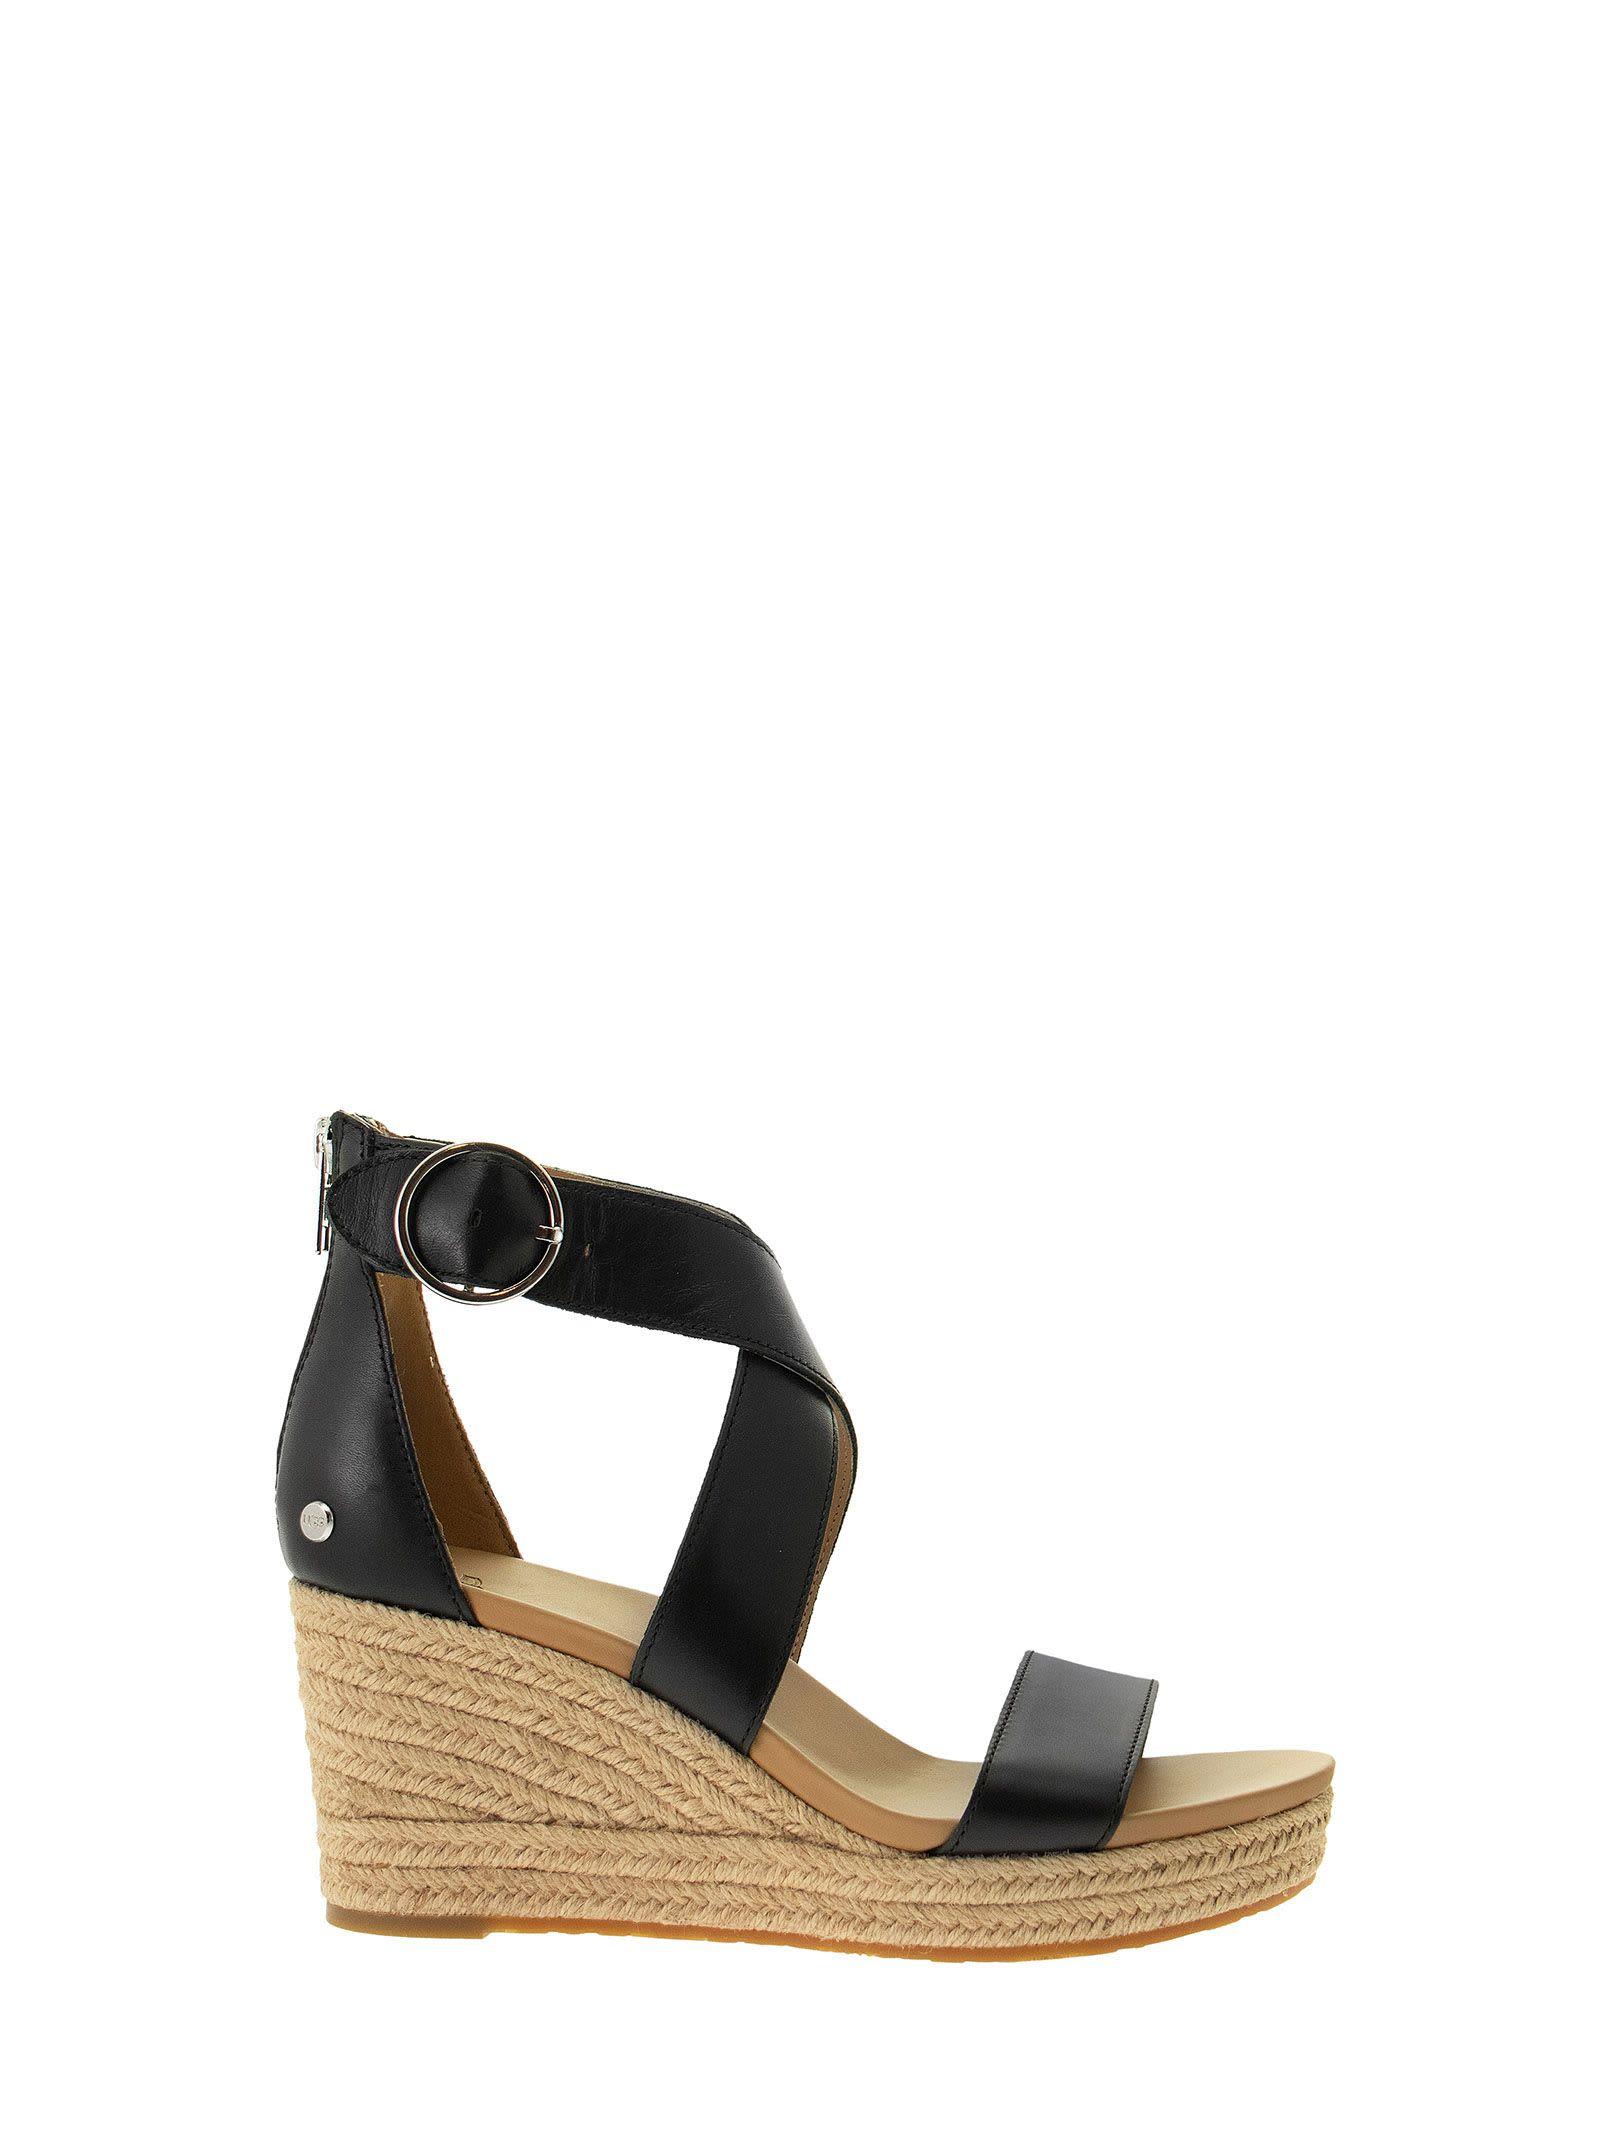 UGG Hylda - Leather Sandal With Wedge